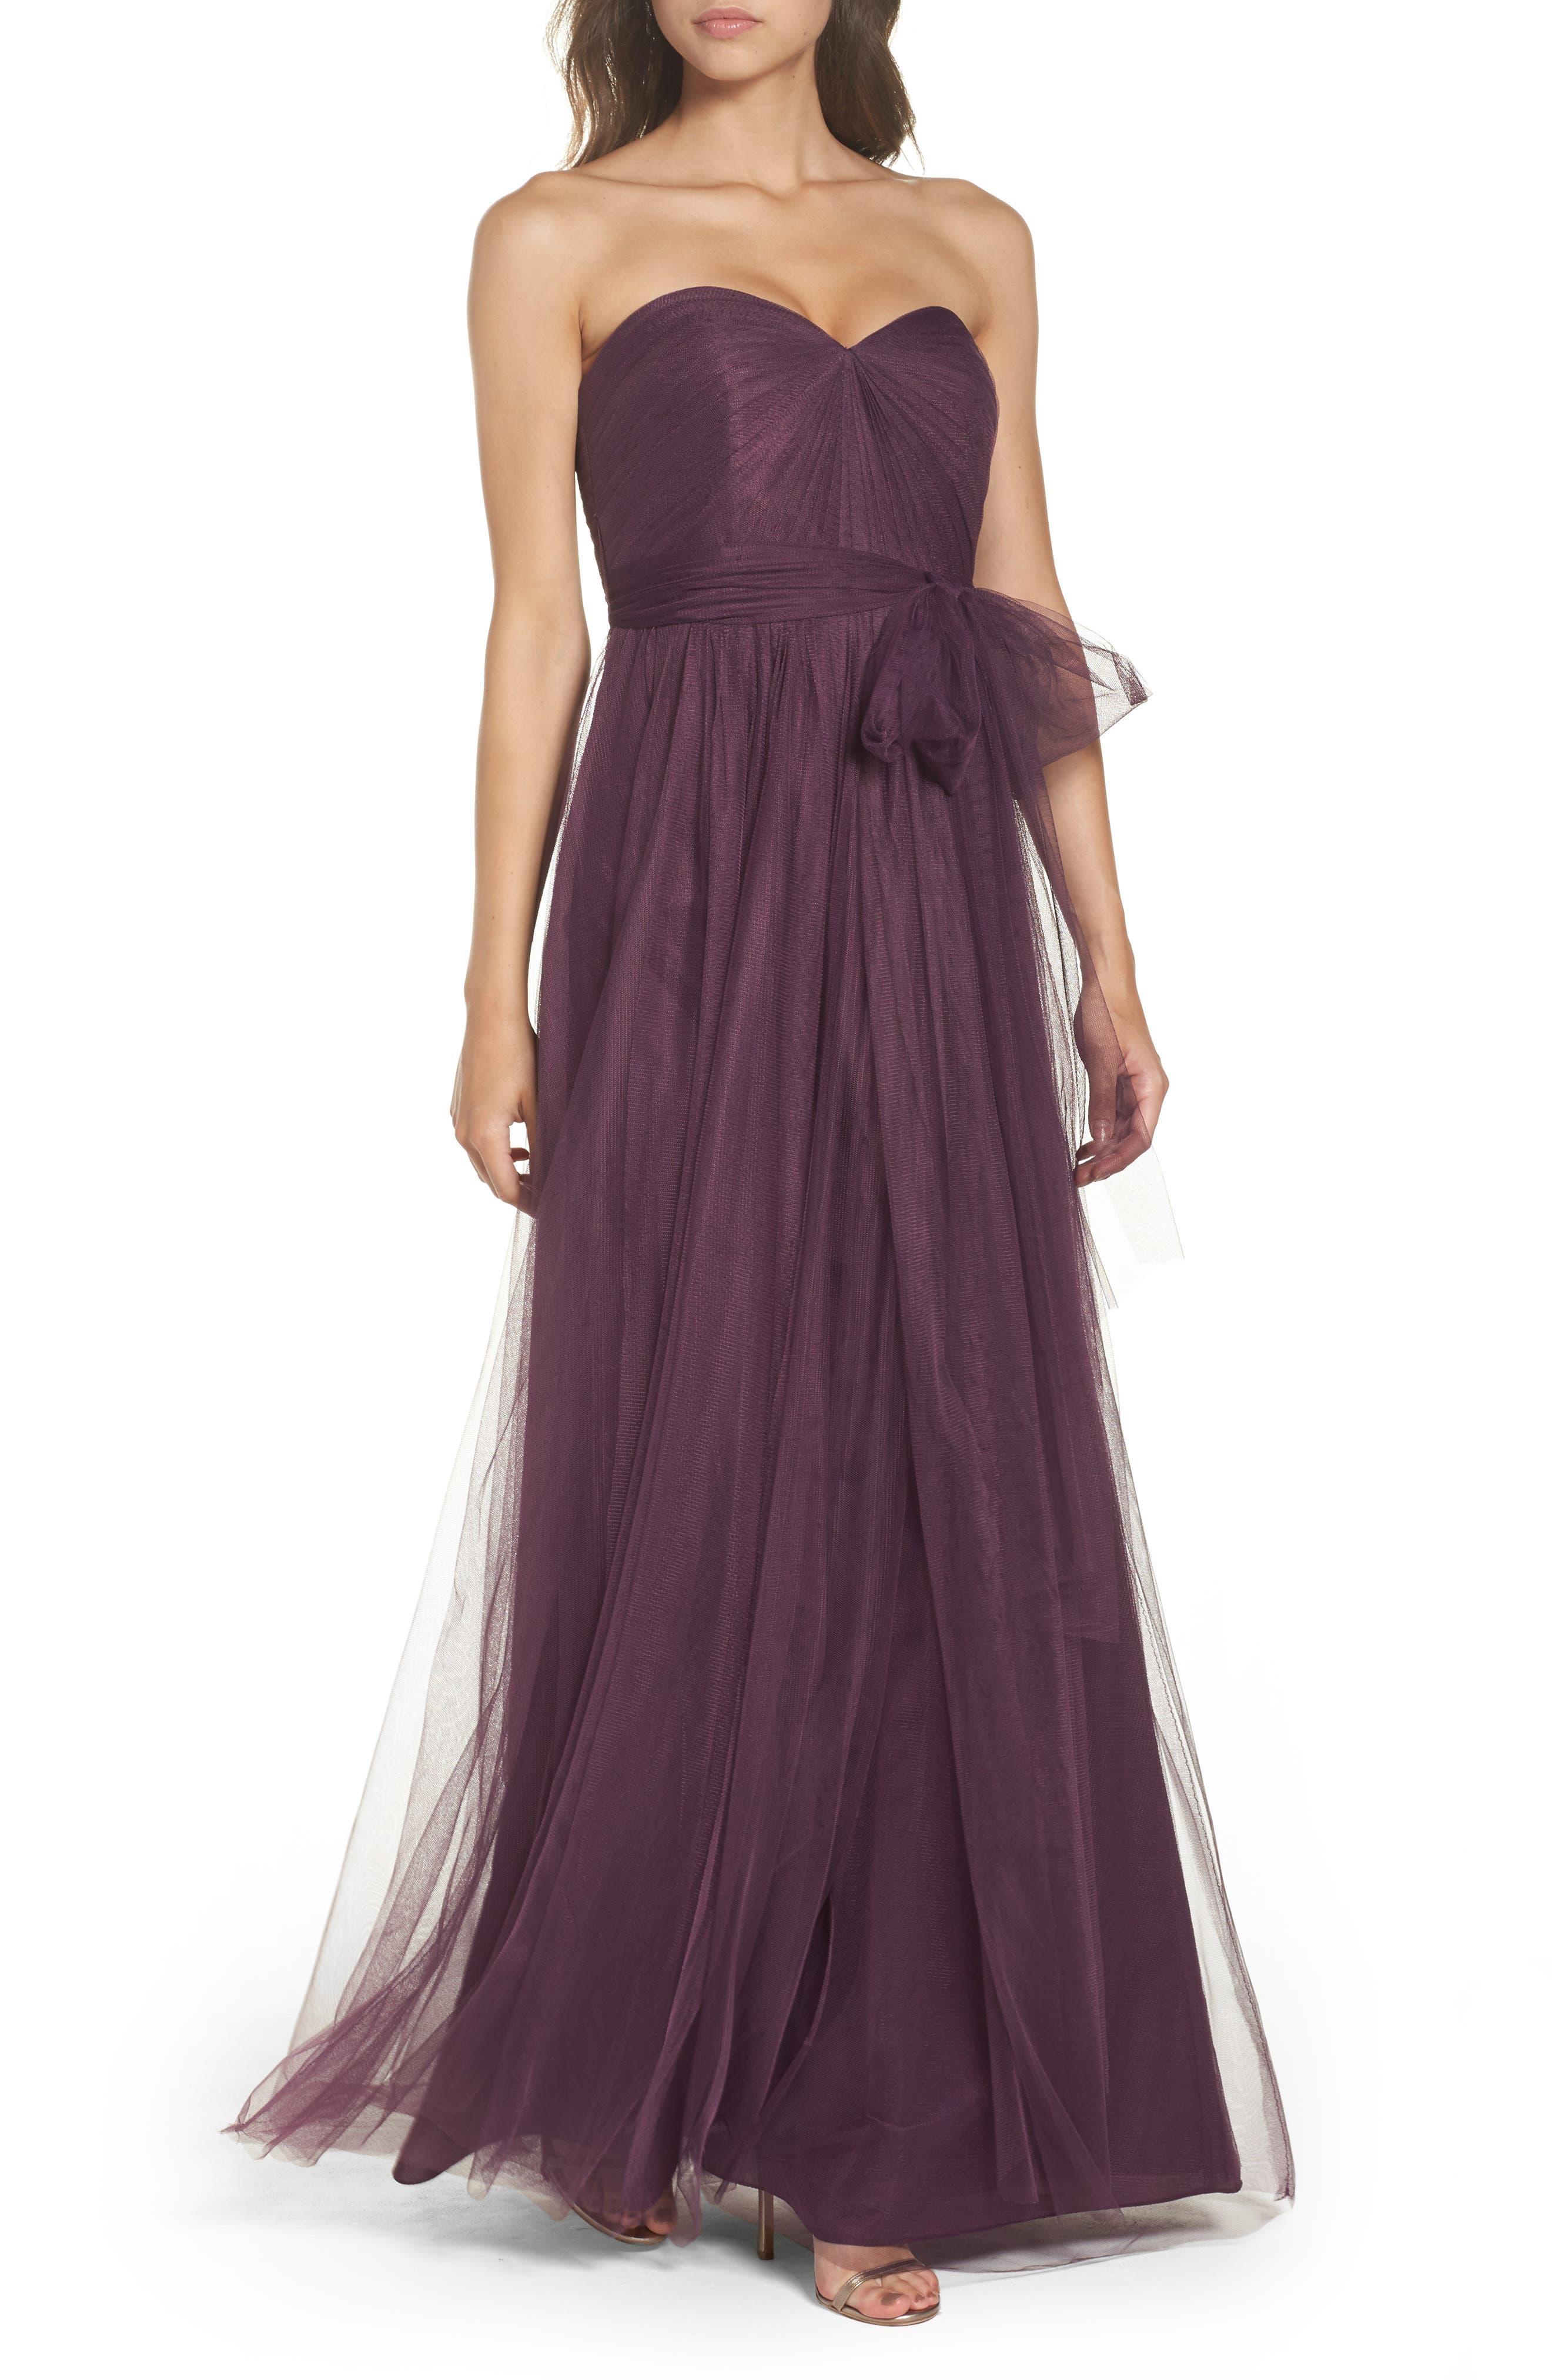 Annabelle Convertible Tulle Column Dress,                         Main,                         color, Raisin